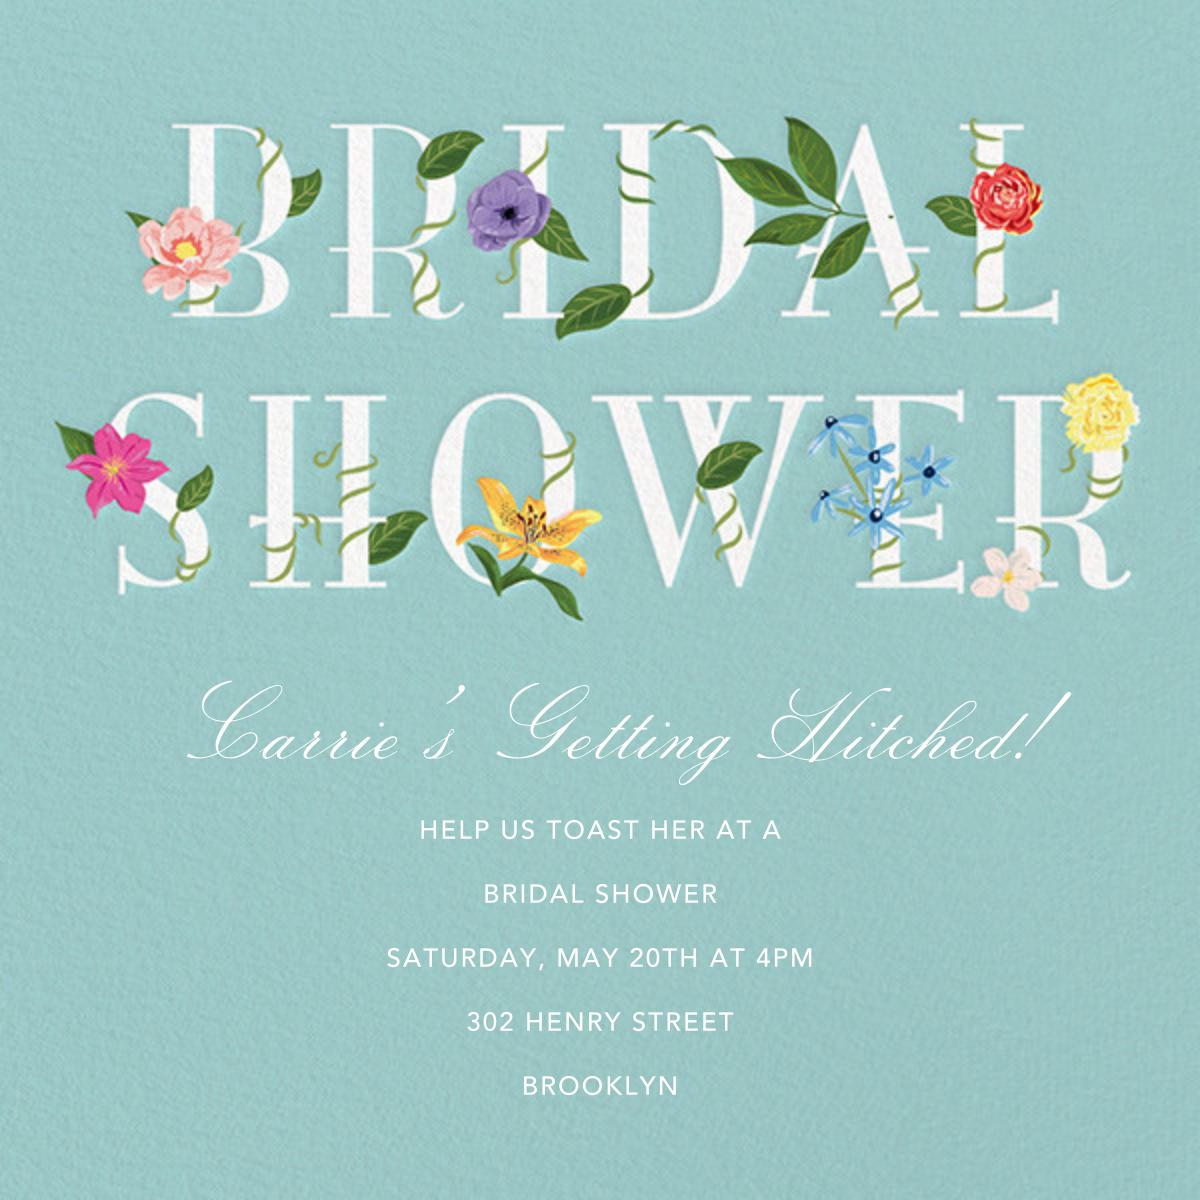 Floral Letters - Paper Source - Bridal shower